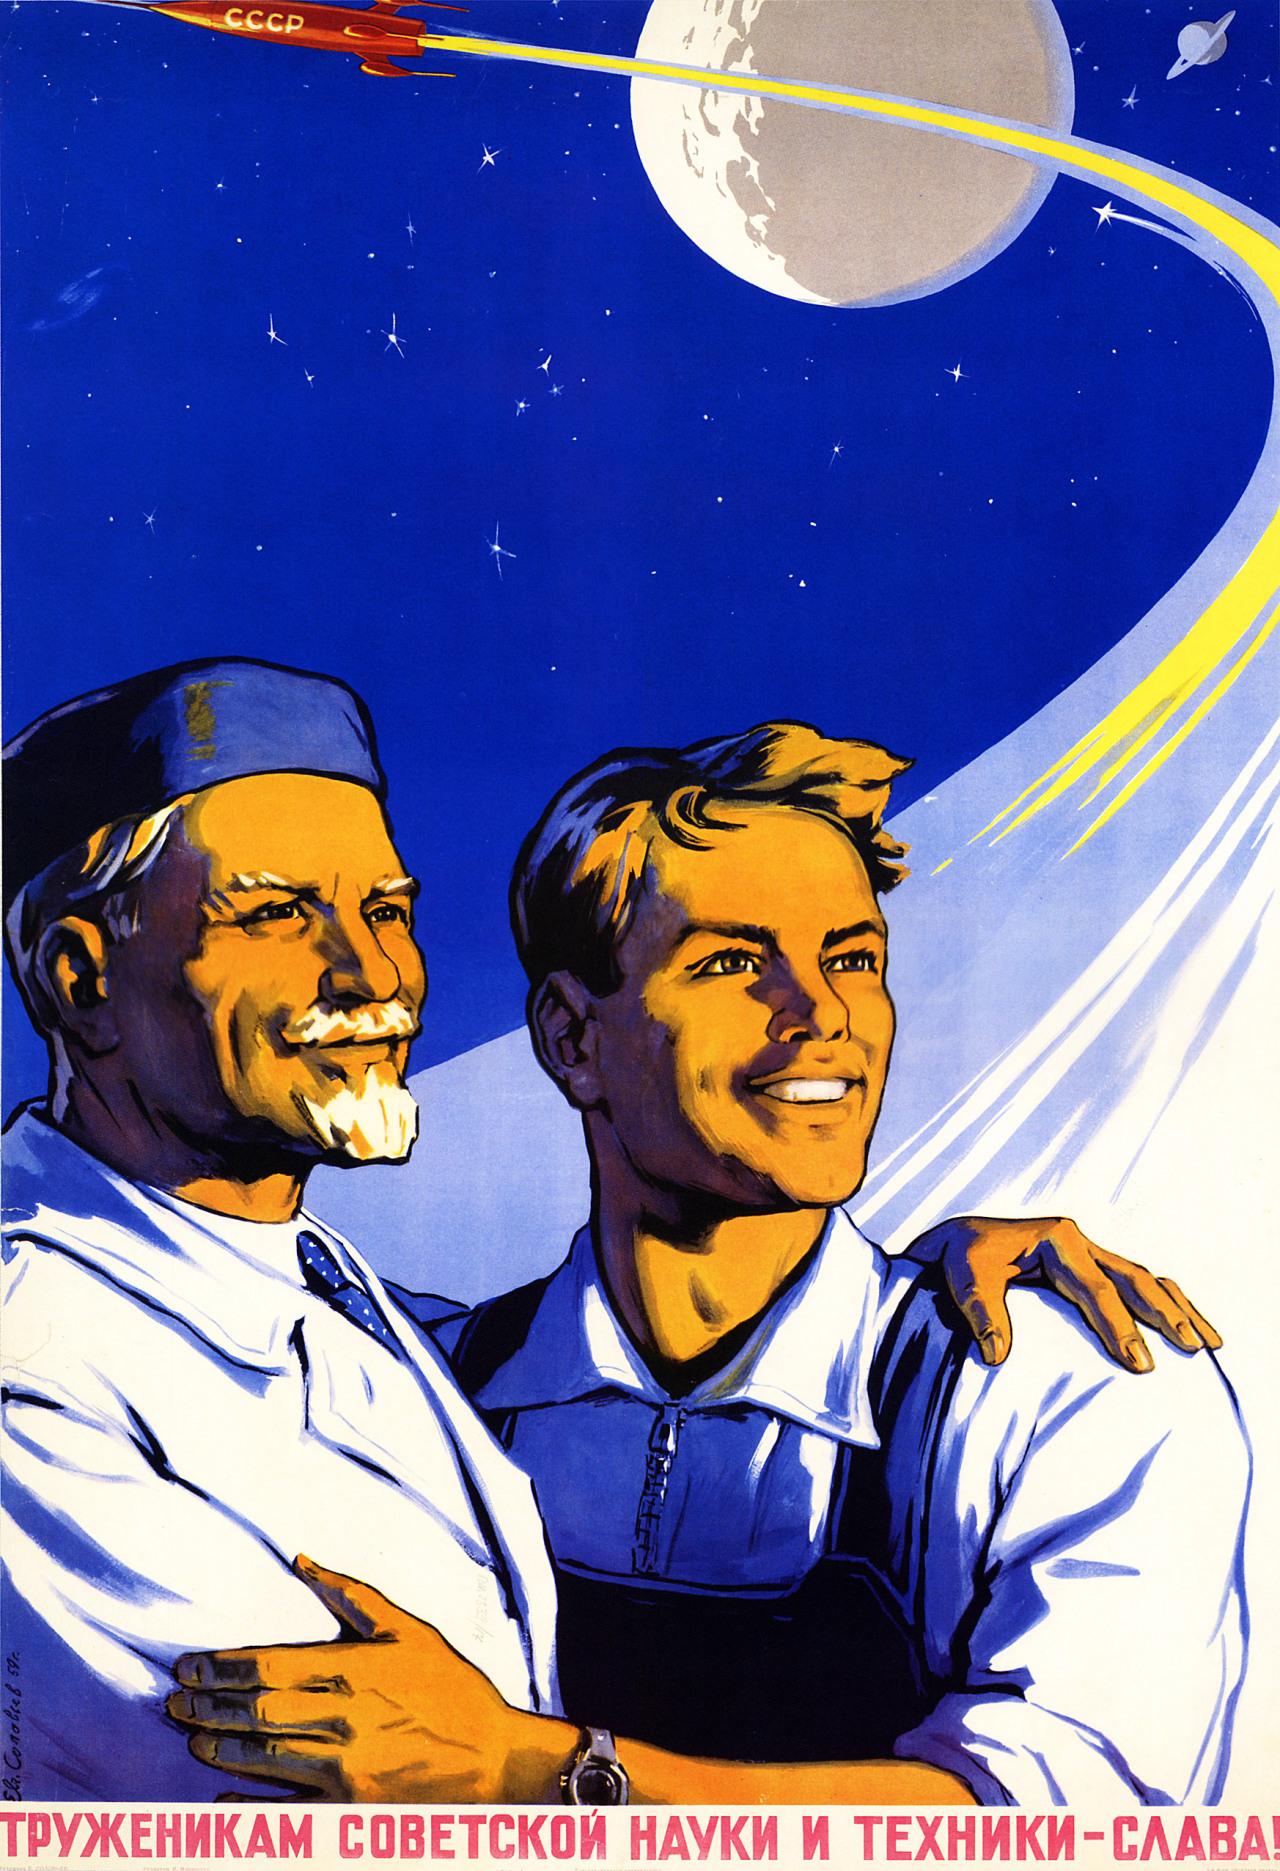 Good Delicious Gerrygreek Propaganda Posters Of The